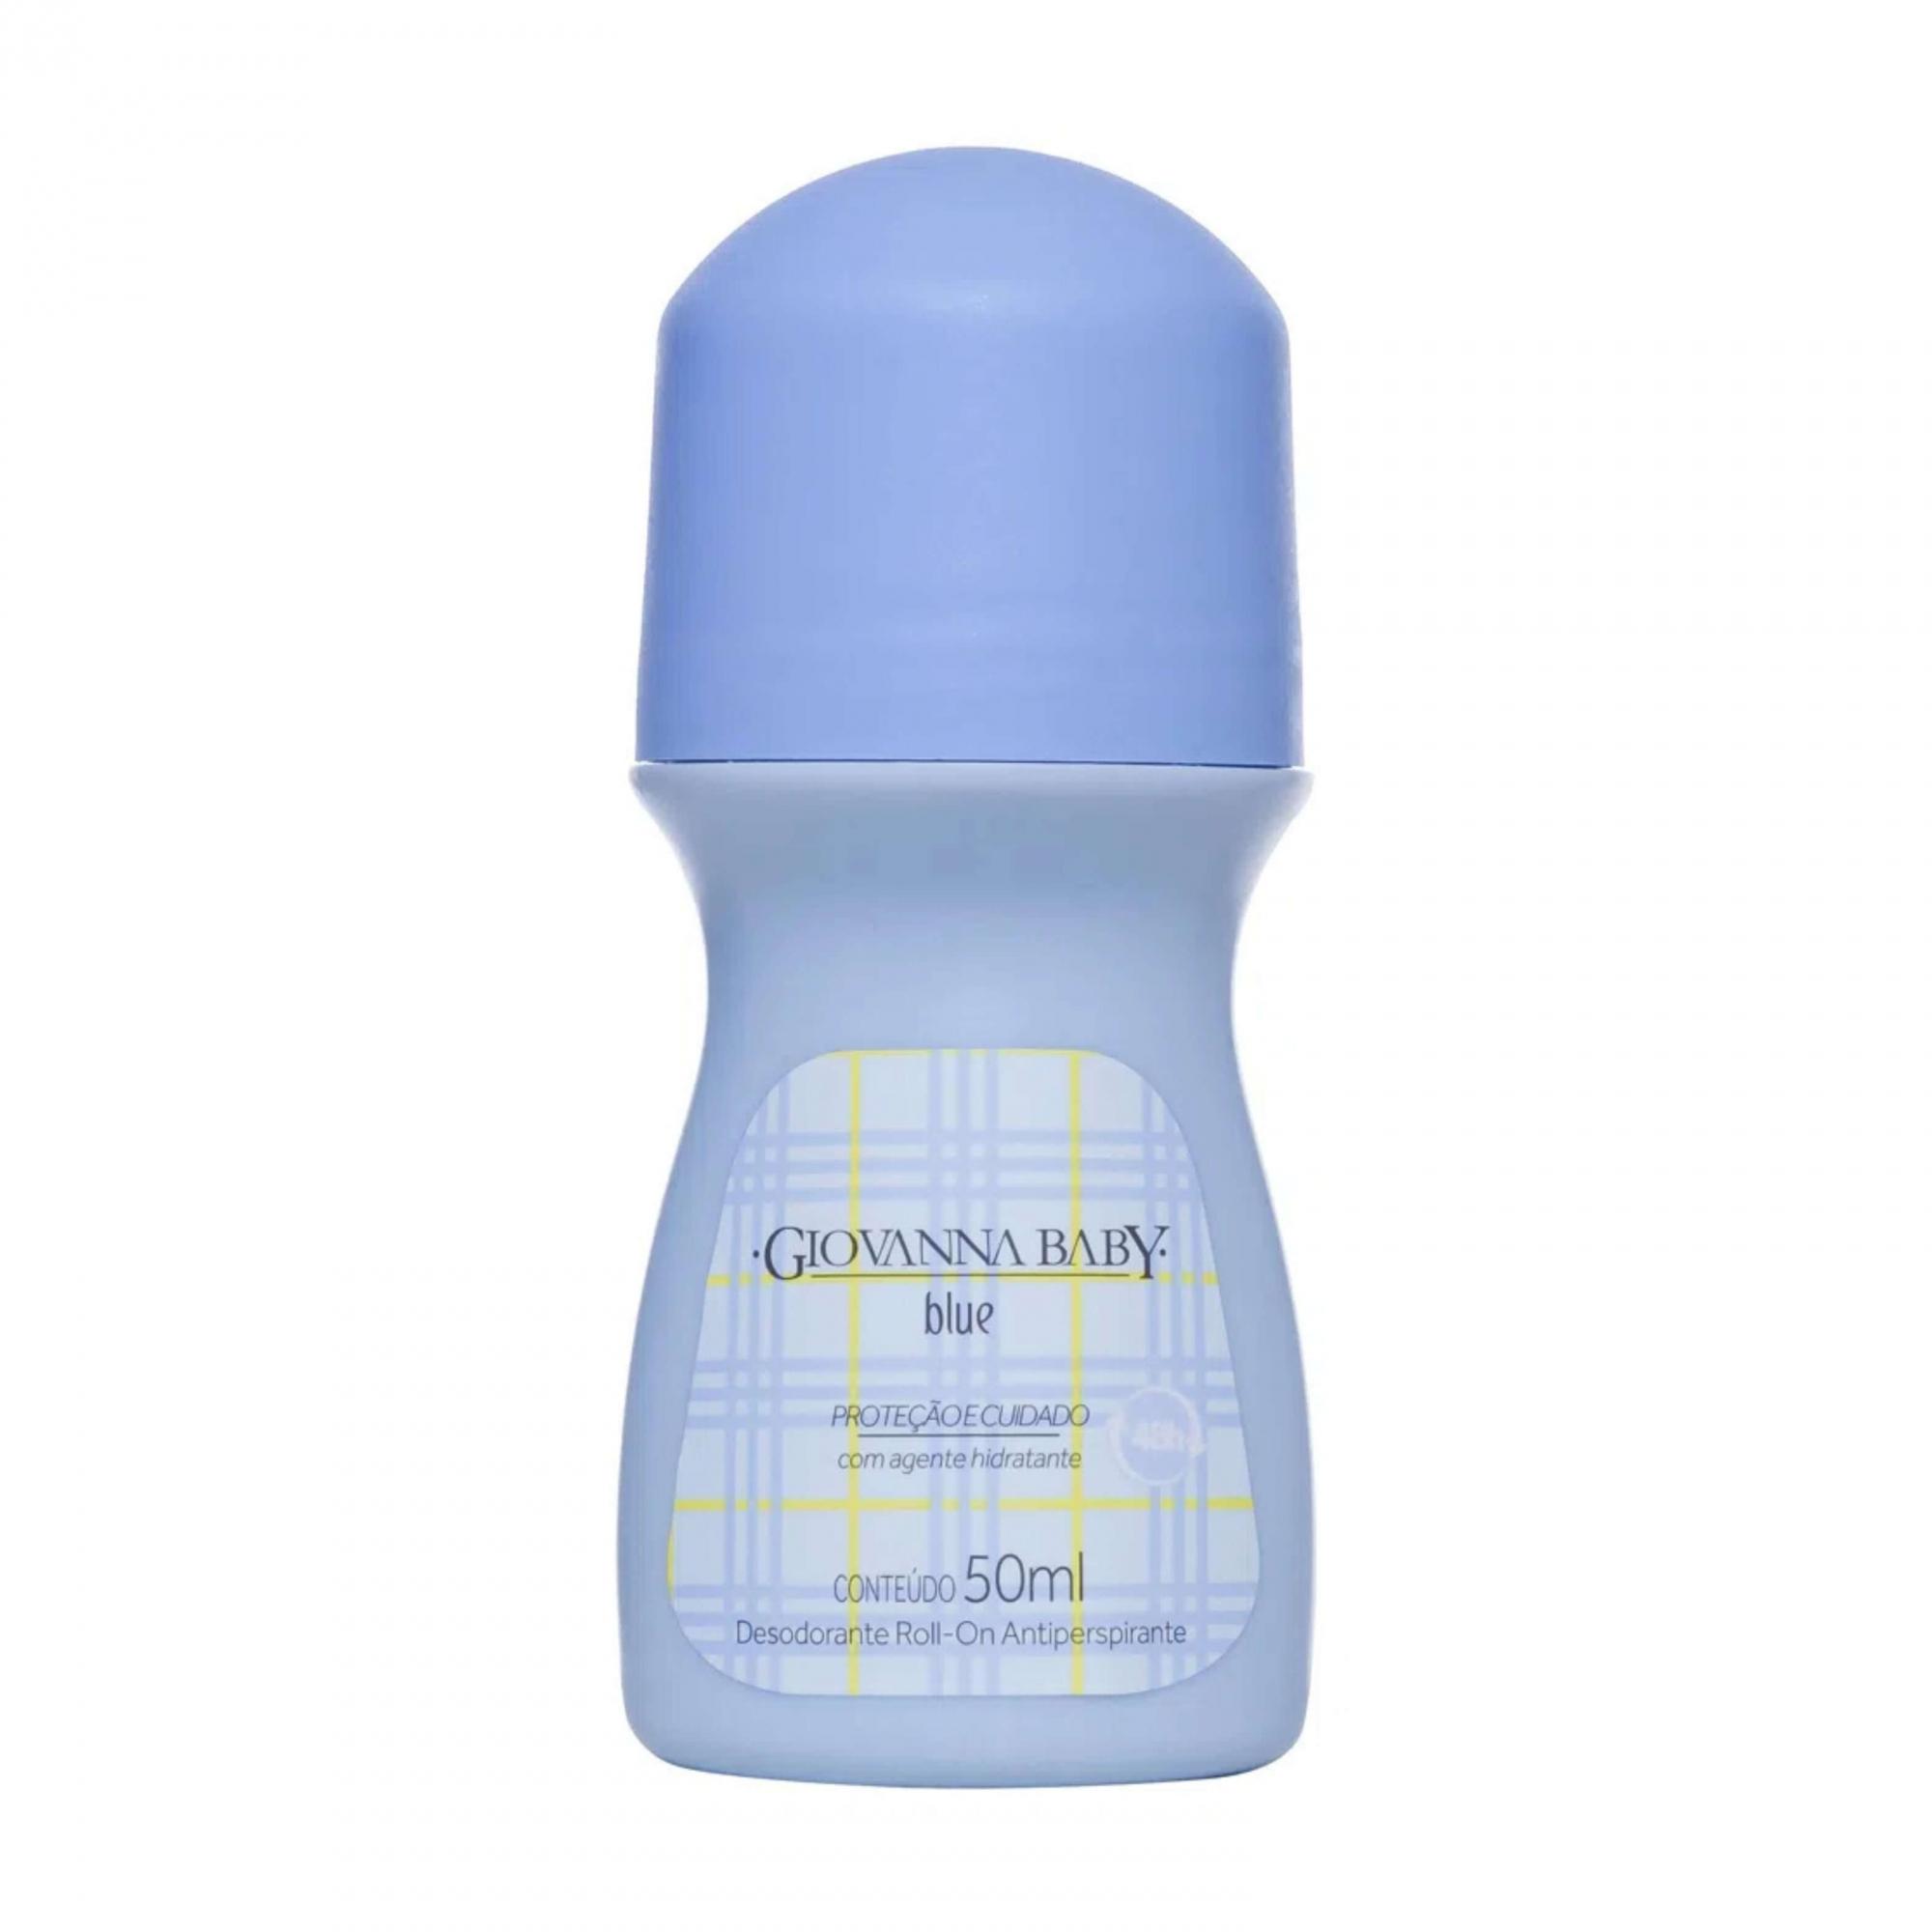 Desodorante Roll-On Blue Giovanna Baby 50ml